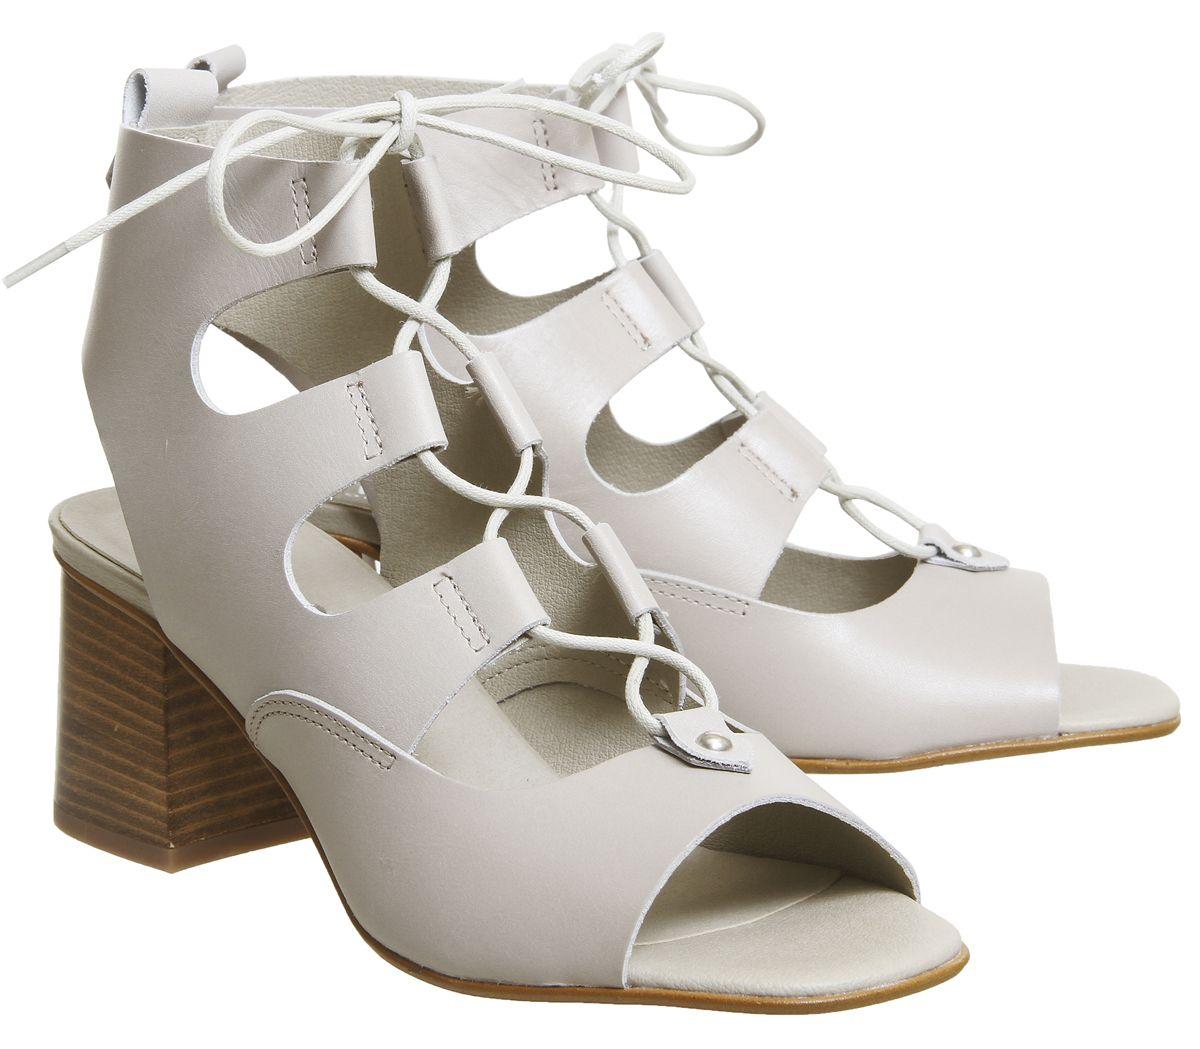 8b281909e61 Office Mallorca Ghillie Block Heels Grey Leather - Mid Heels